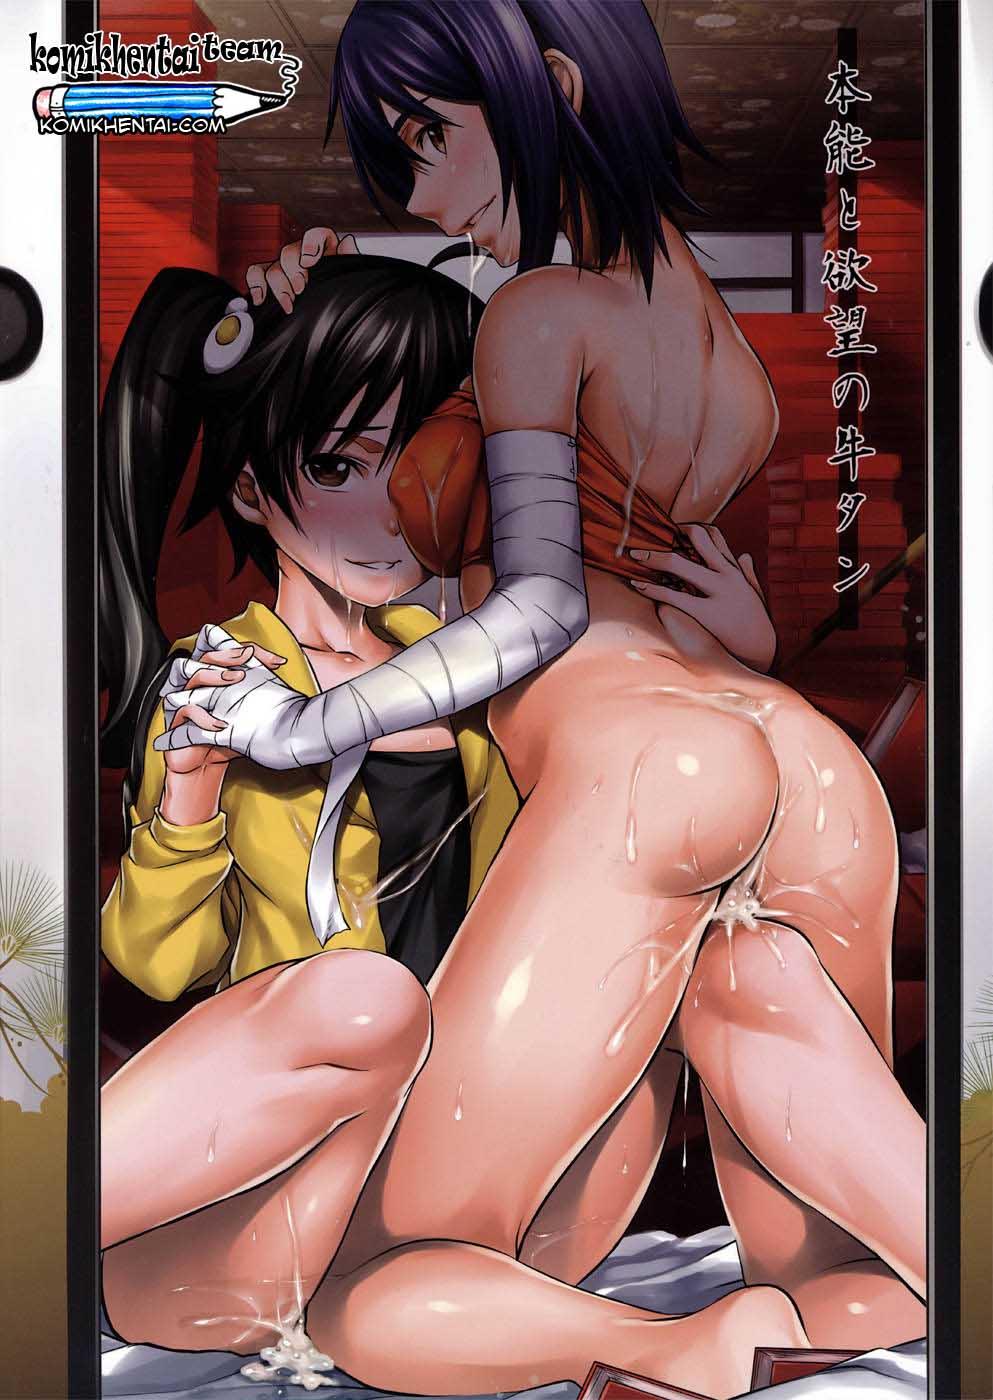 Komik Hentai Bakemonogatari – Snack Of Human